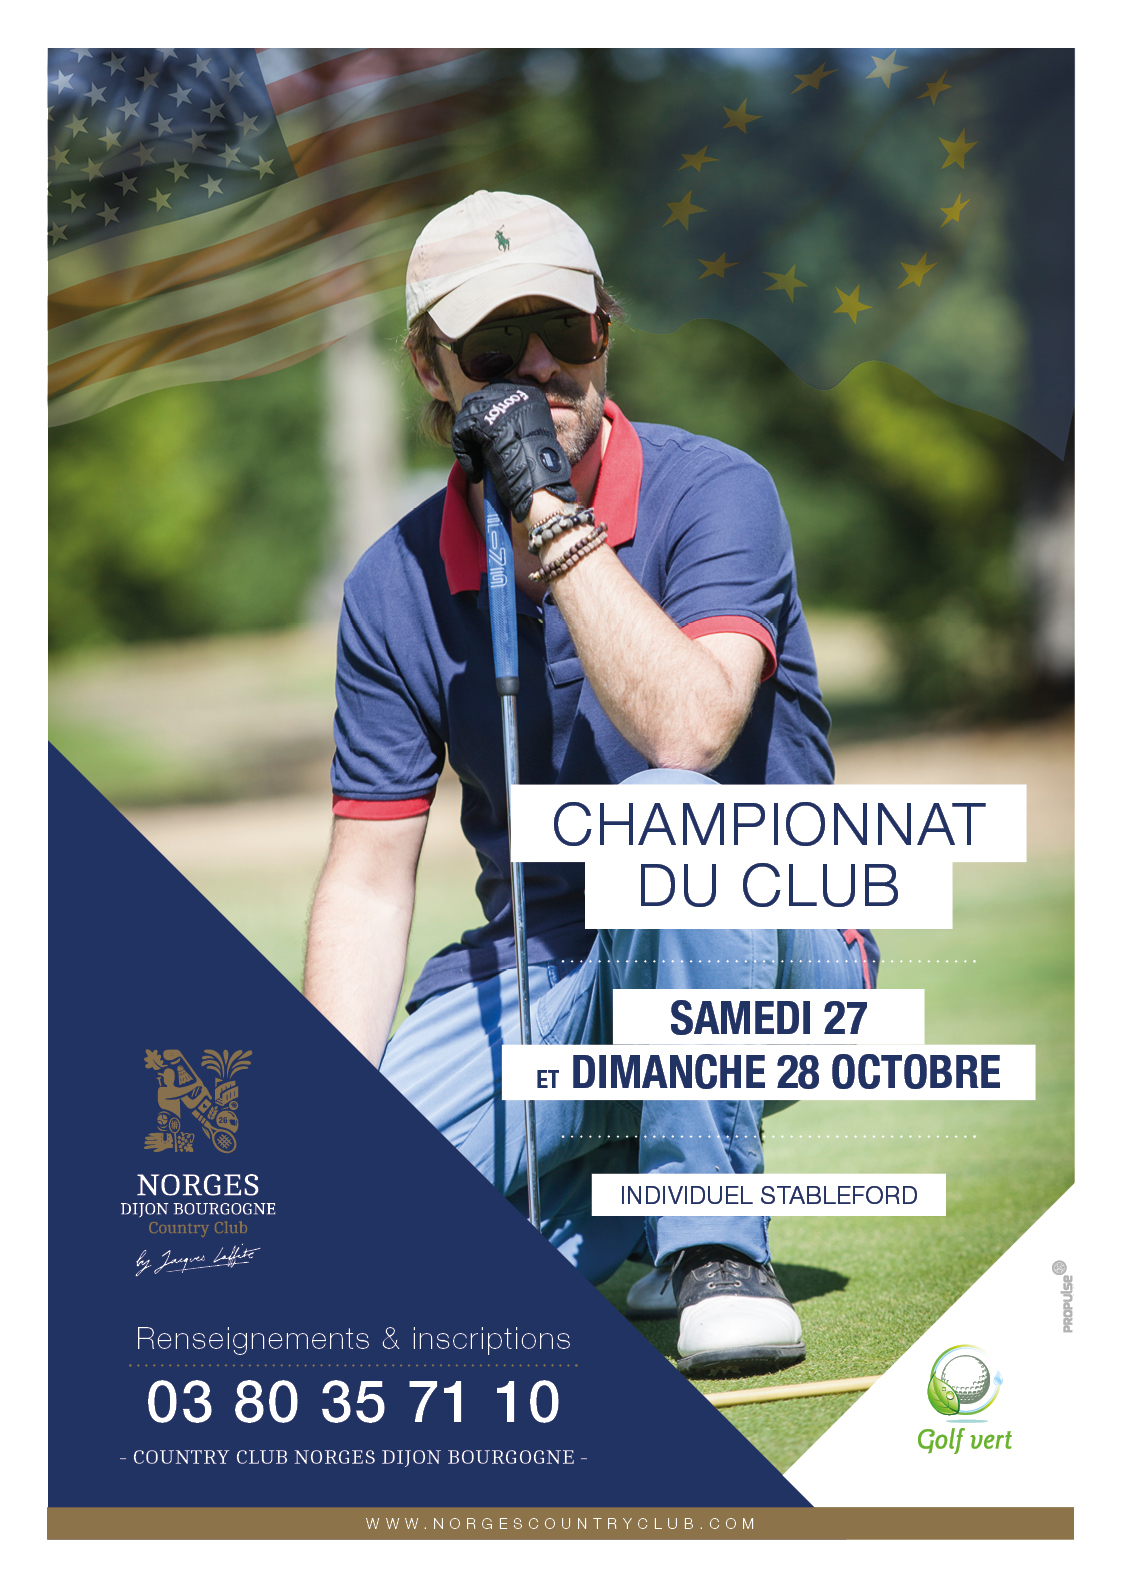 Championnat du club